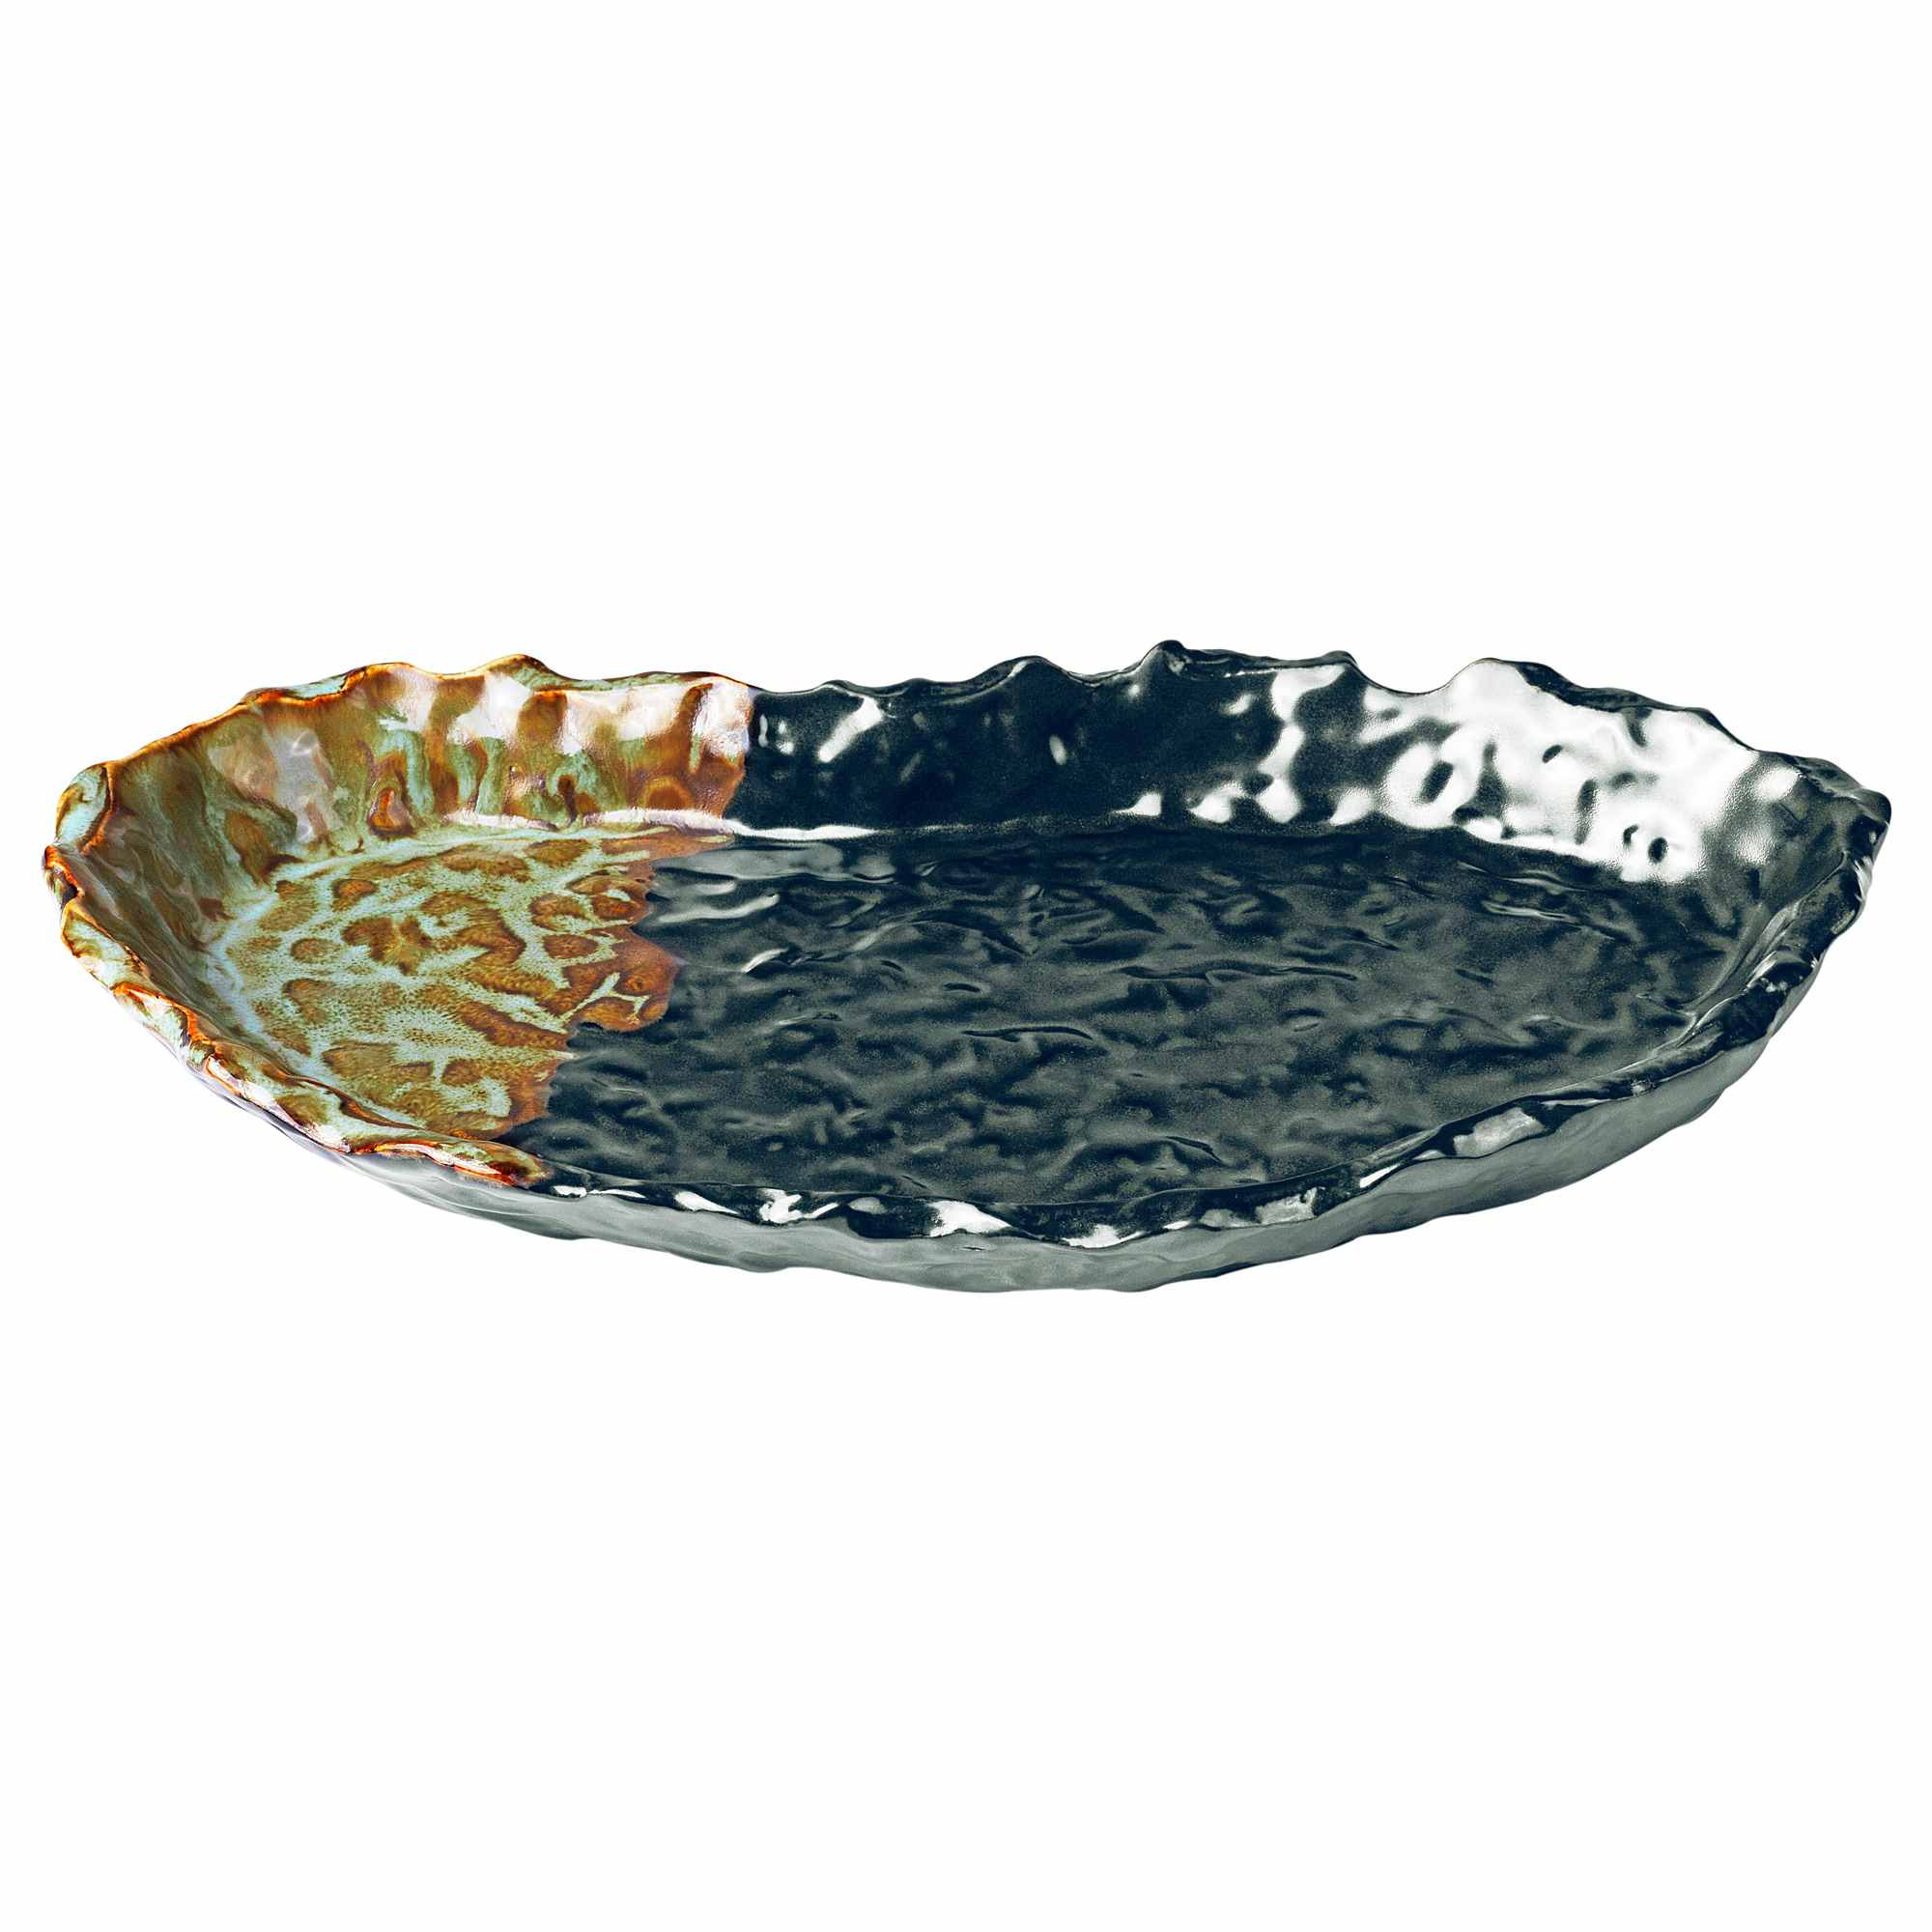 ANNANSTANS Handmade Plate